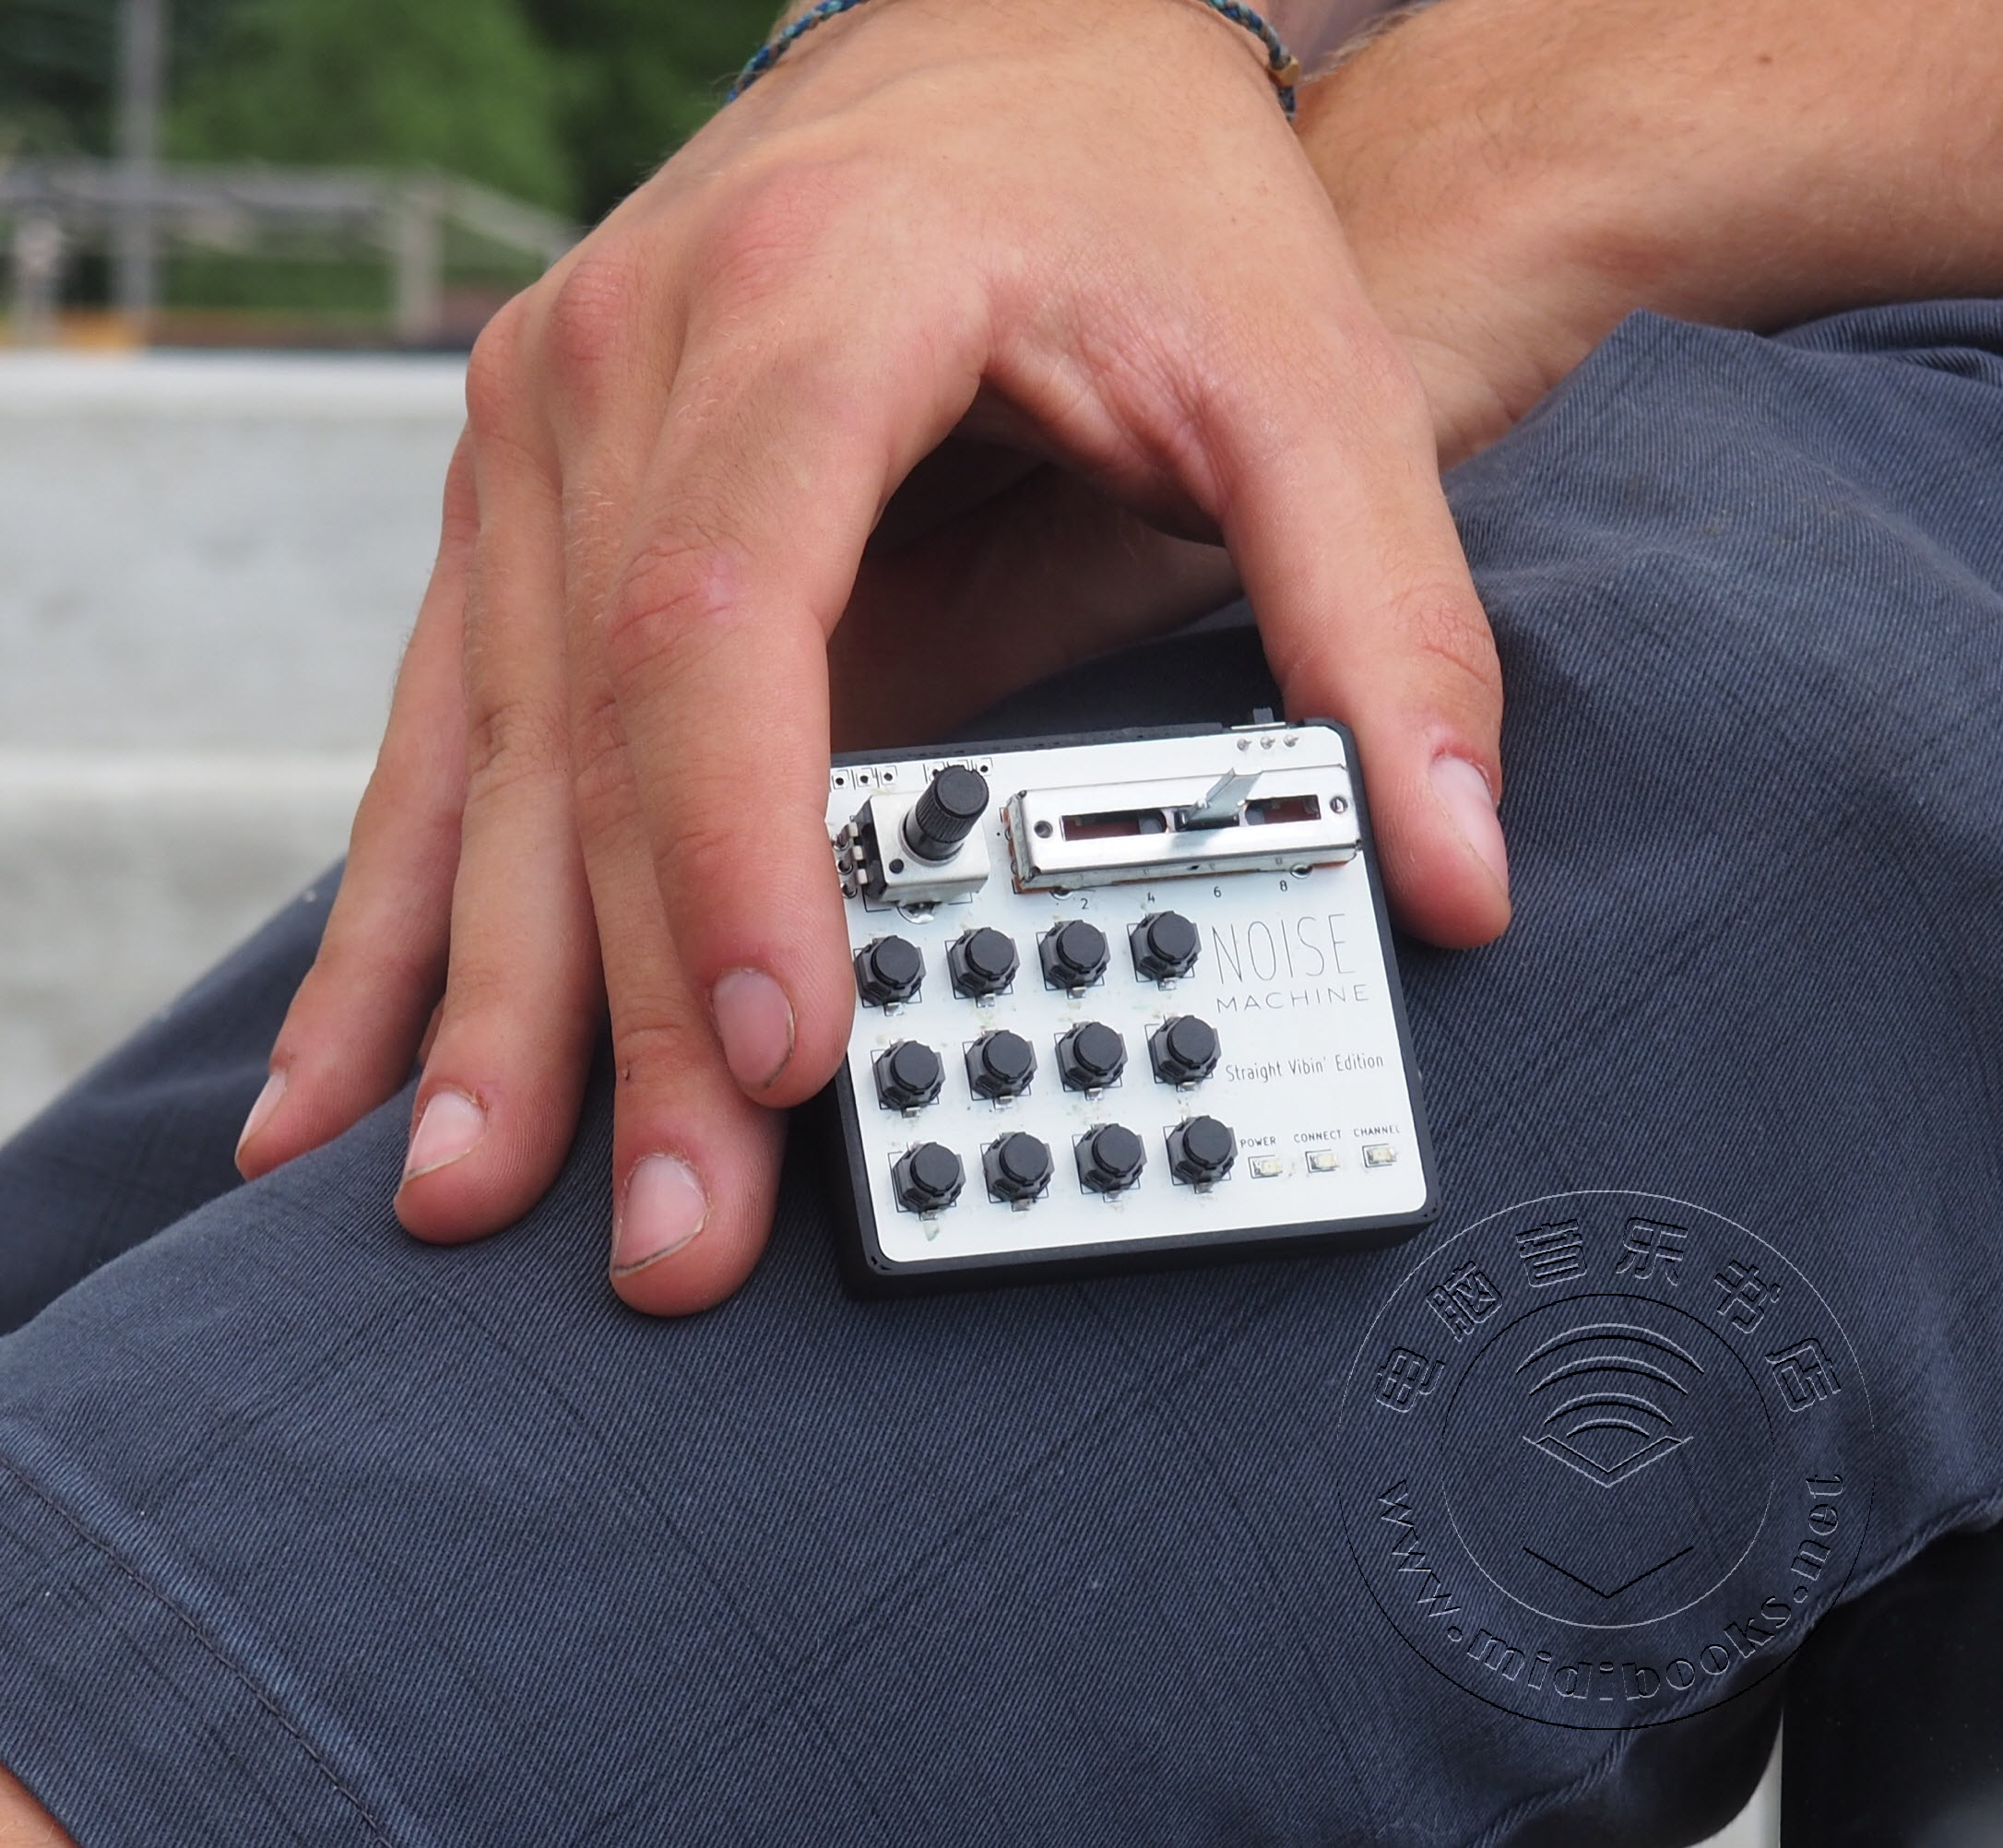 Noise Machine,据说是世界上最小的超便携MIDI控制器(视频)